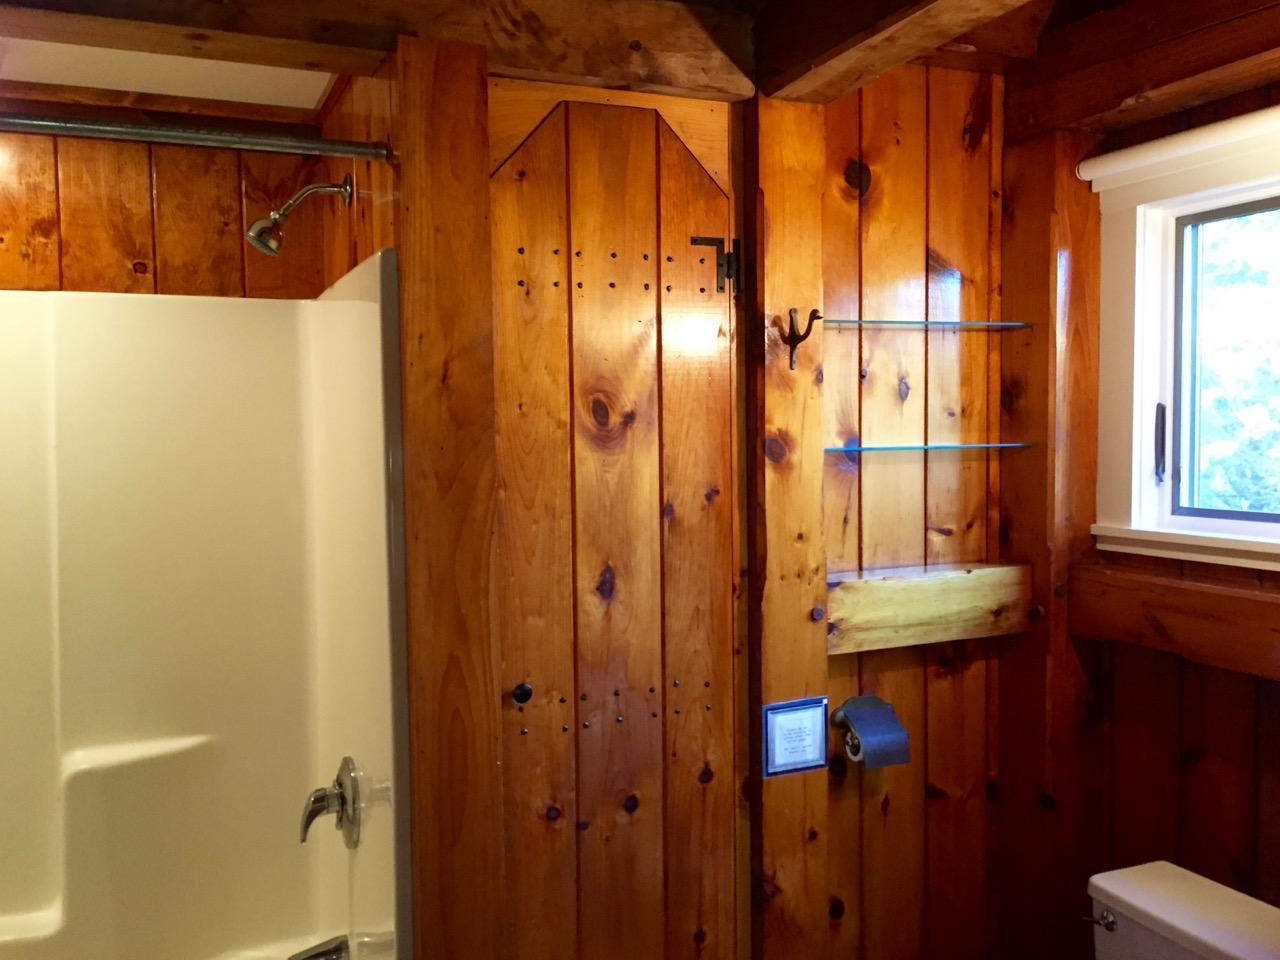 Full first floor bath